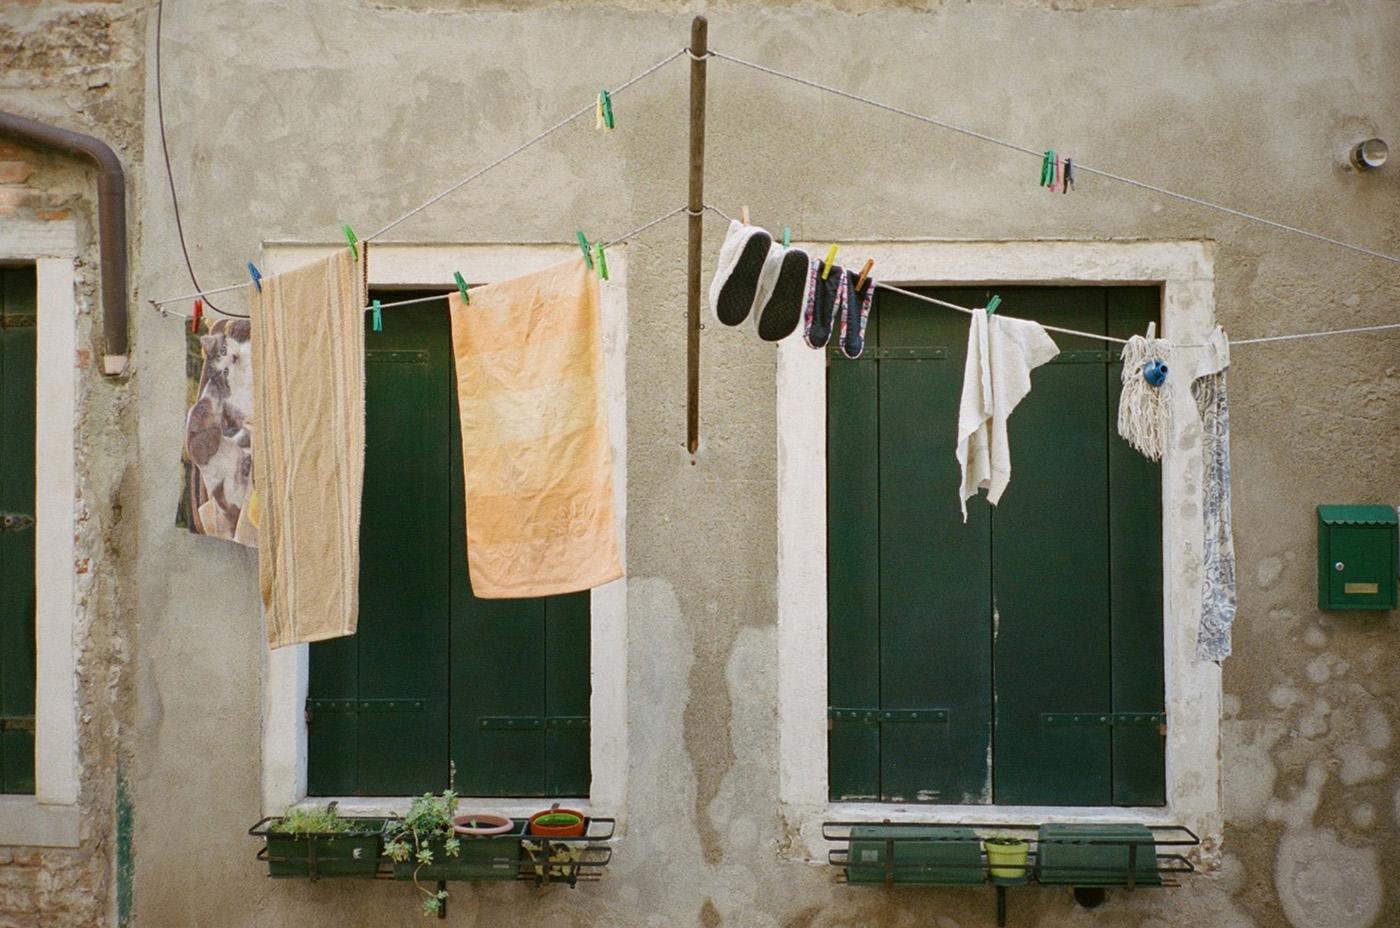 Deborah_Farnault_Venice_Biennale_Italy_2019_00020032_2.jpg